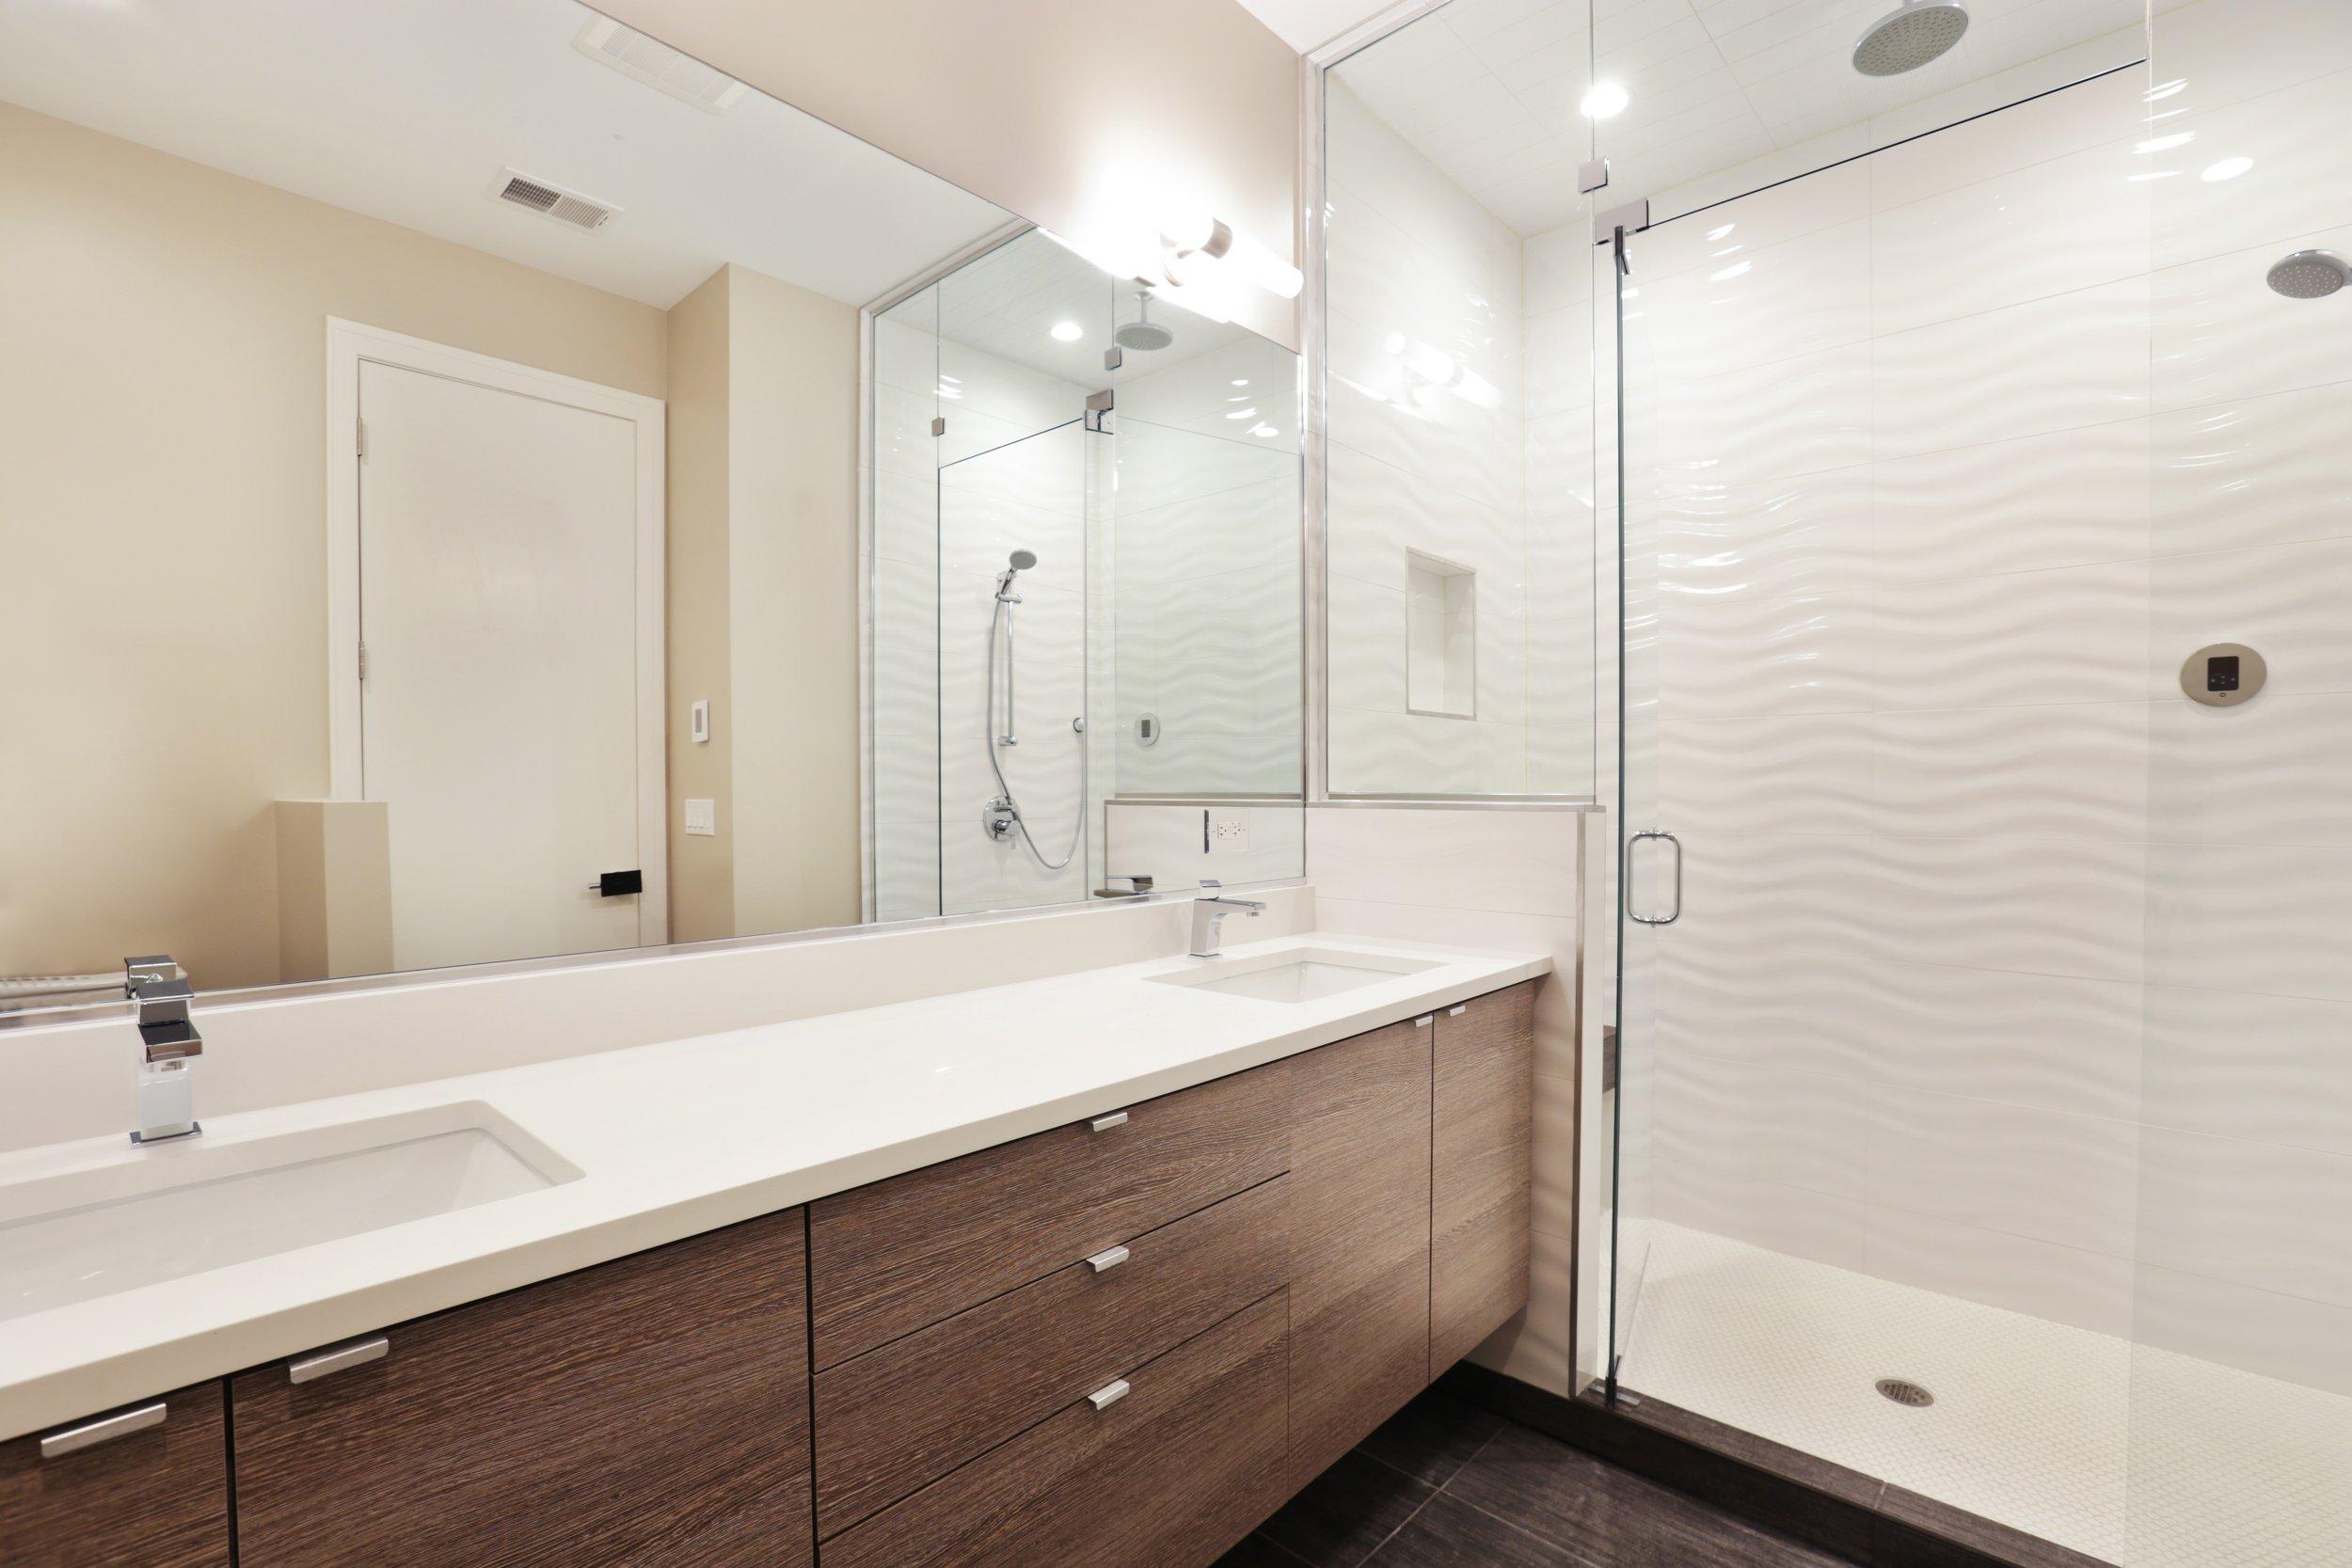 Example Unit 2/3 Master Bath